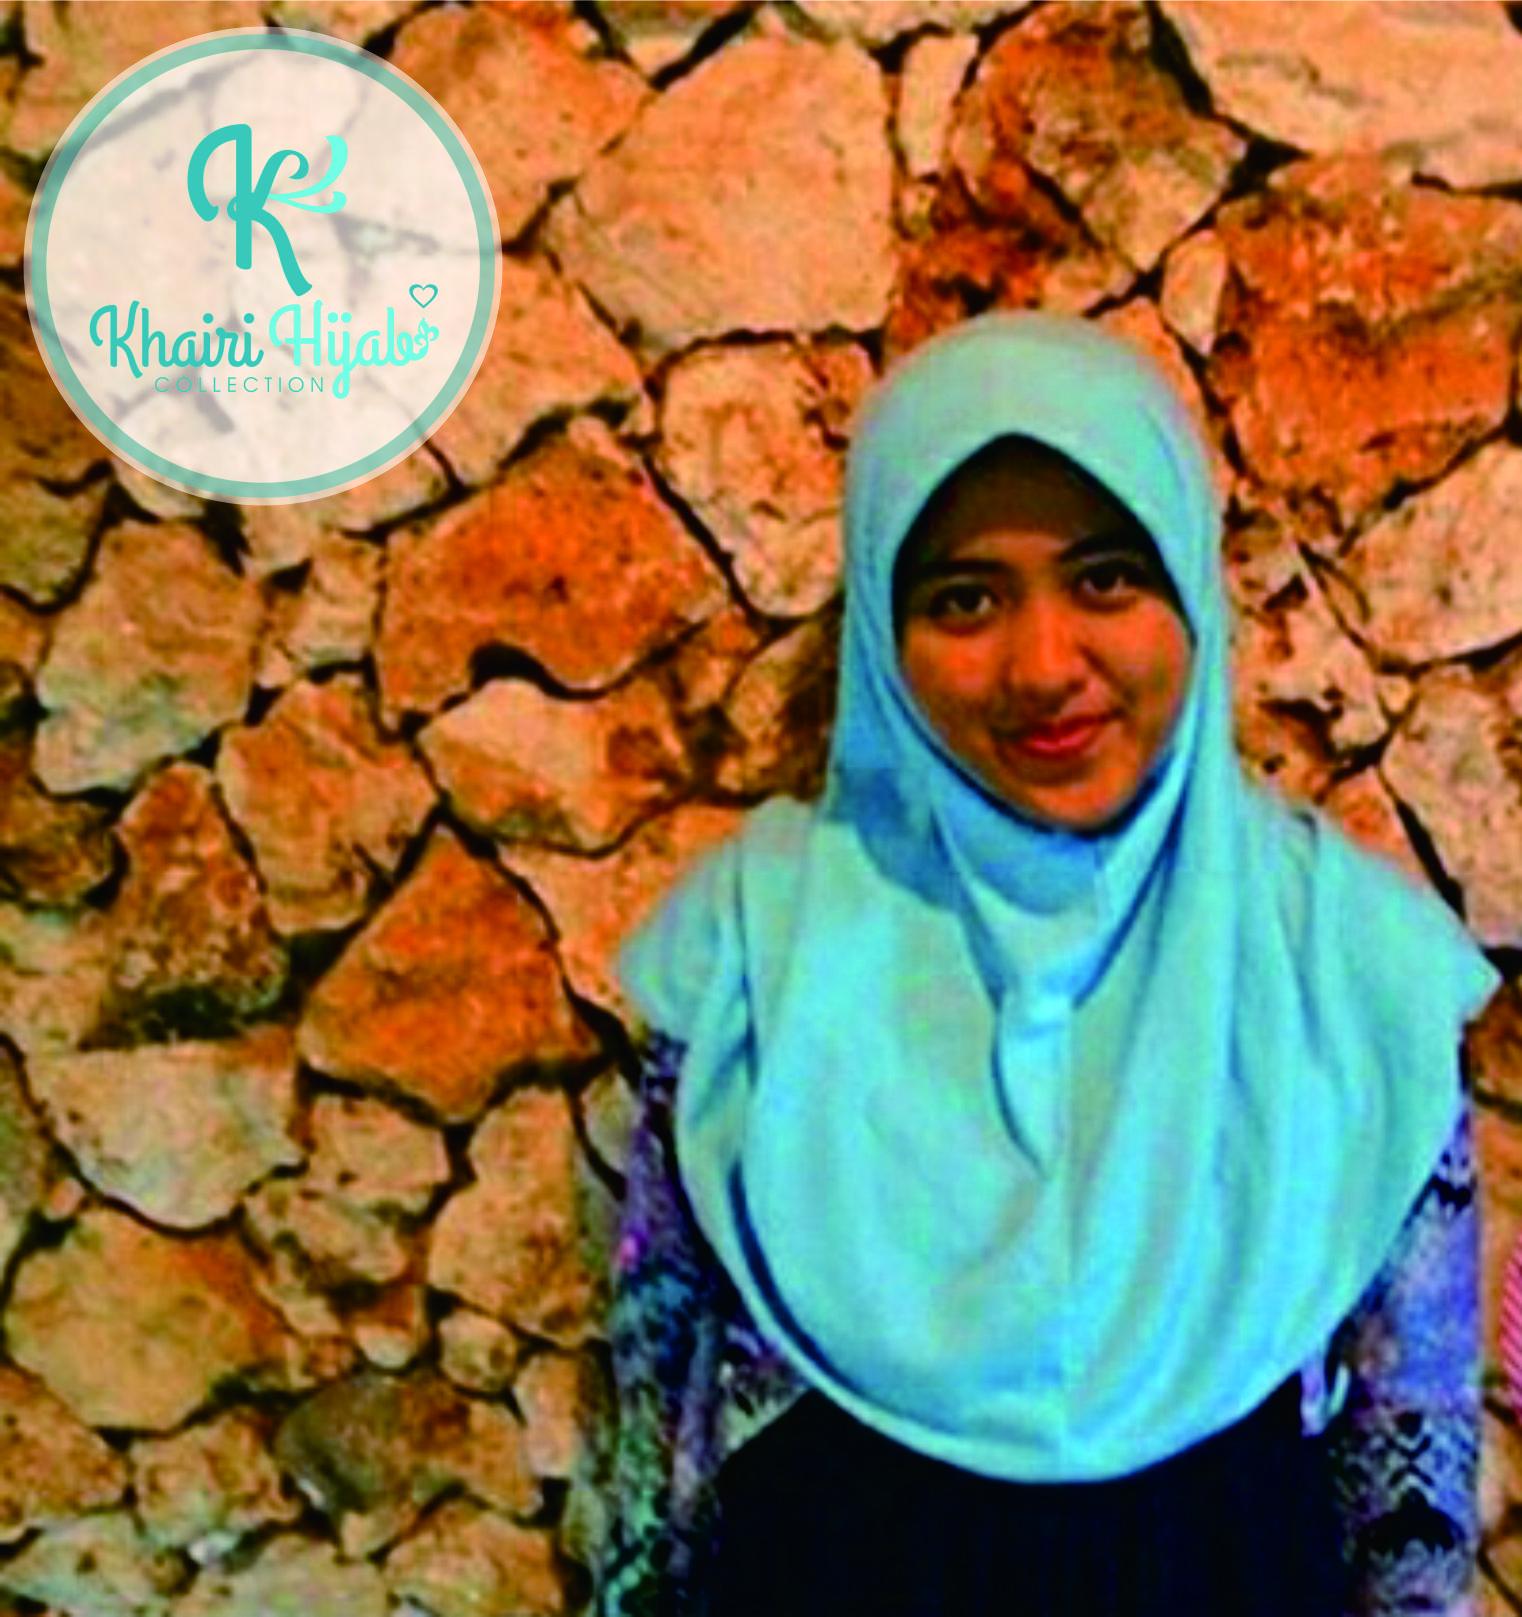 Jual Jilbab Polos Hijab Kaos Jilbab adem Jilbab Sekolah Size XXL Khairi Hijab